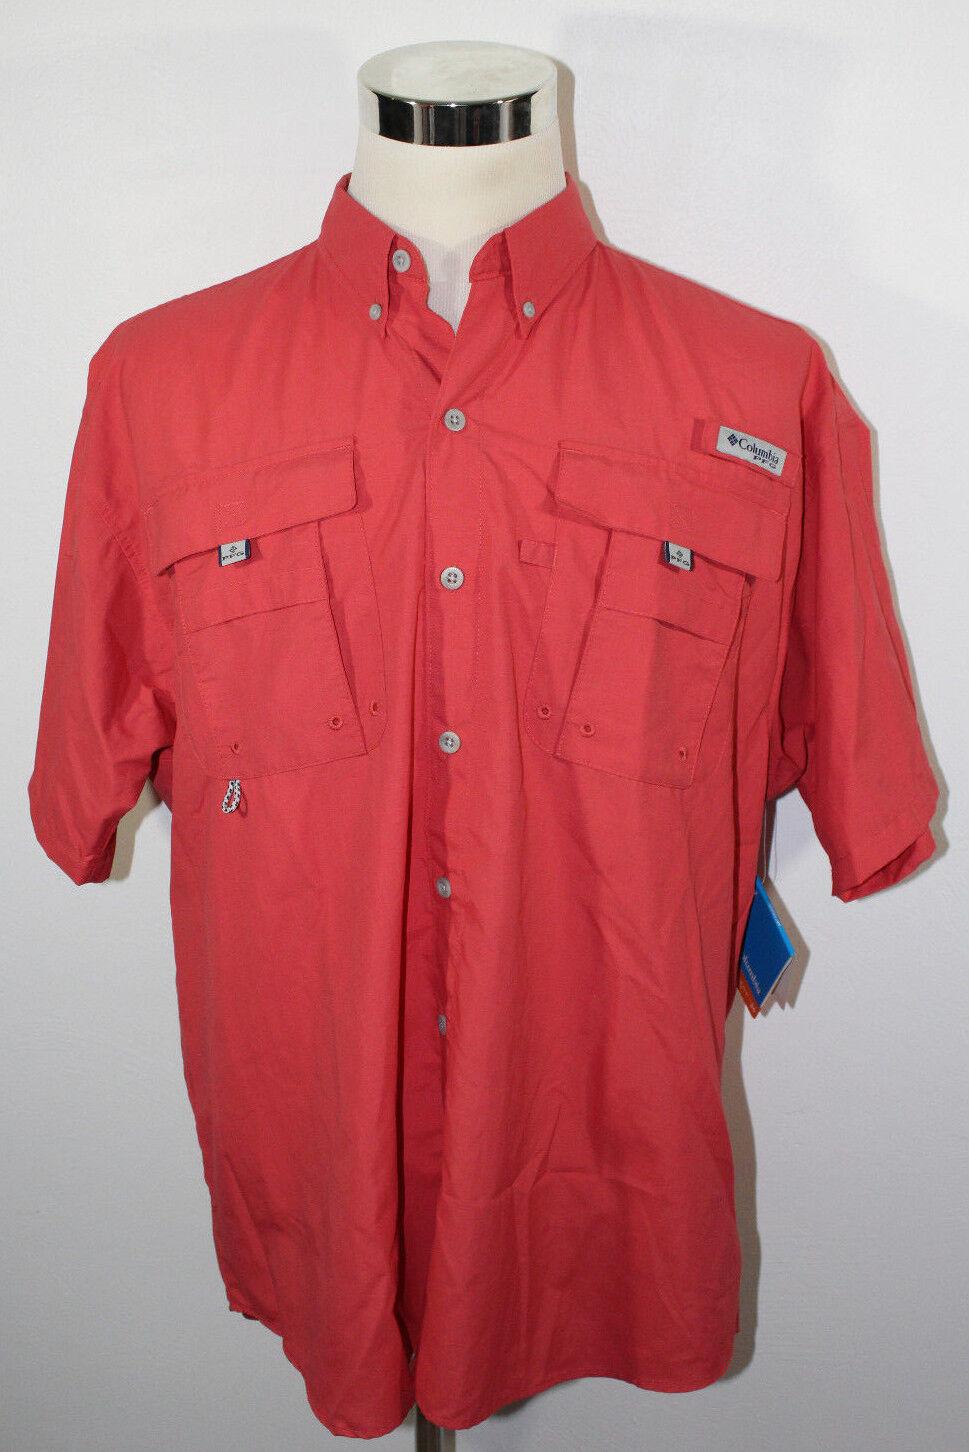 NWT Columbia PFG Performance Fishing Gear Red Salmon Button Up Shirt Sz Large